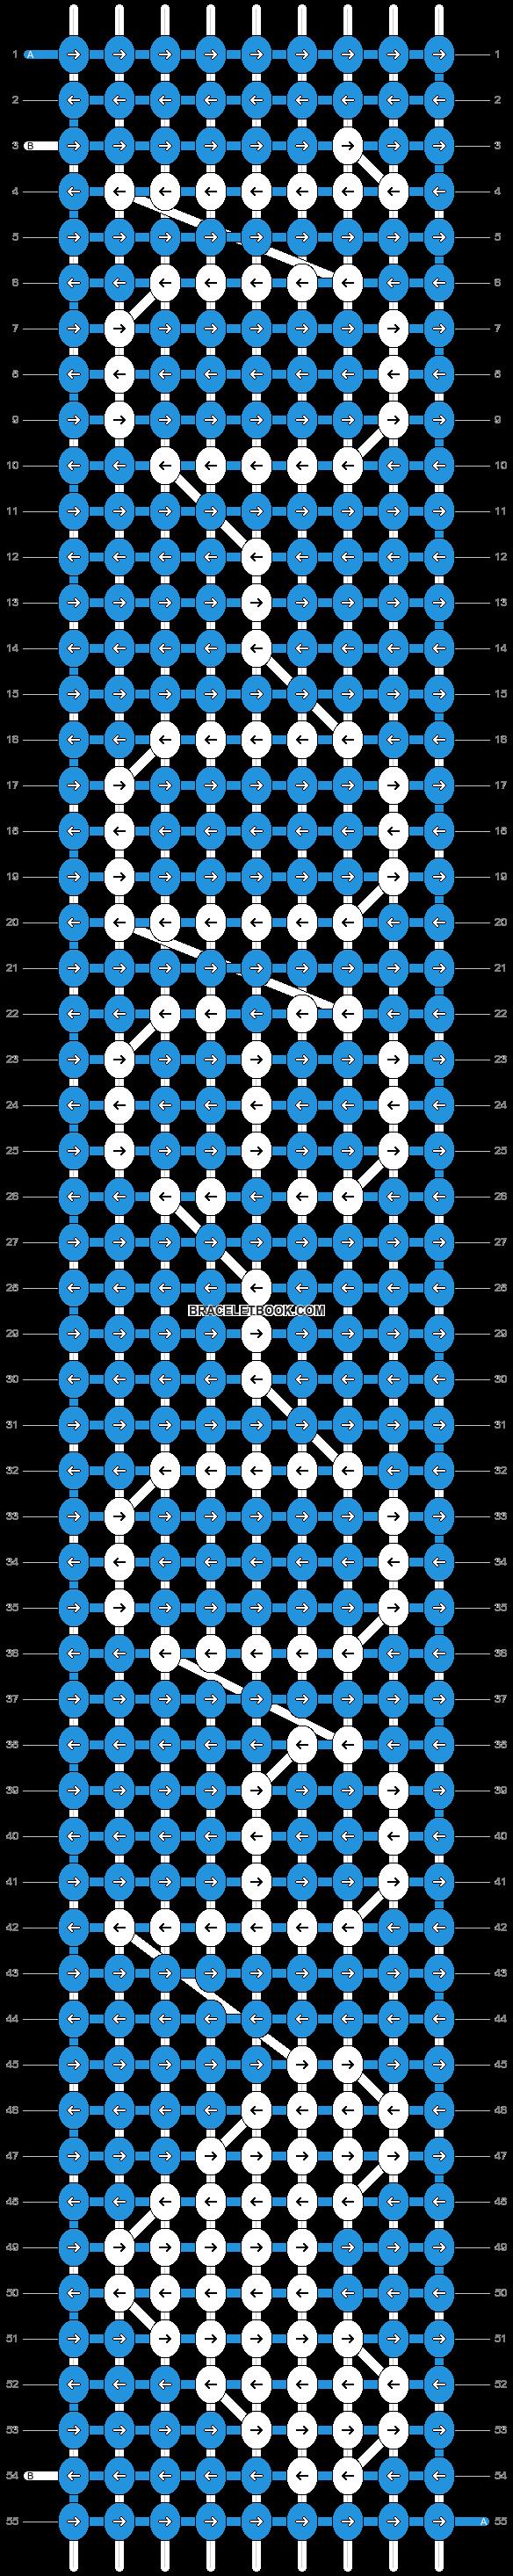 Alpha pattern #6450 pattern